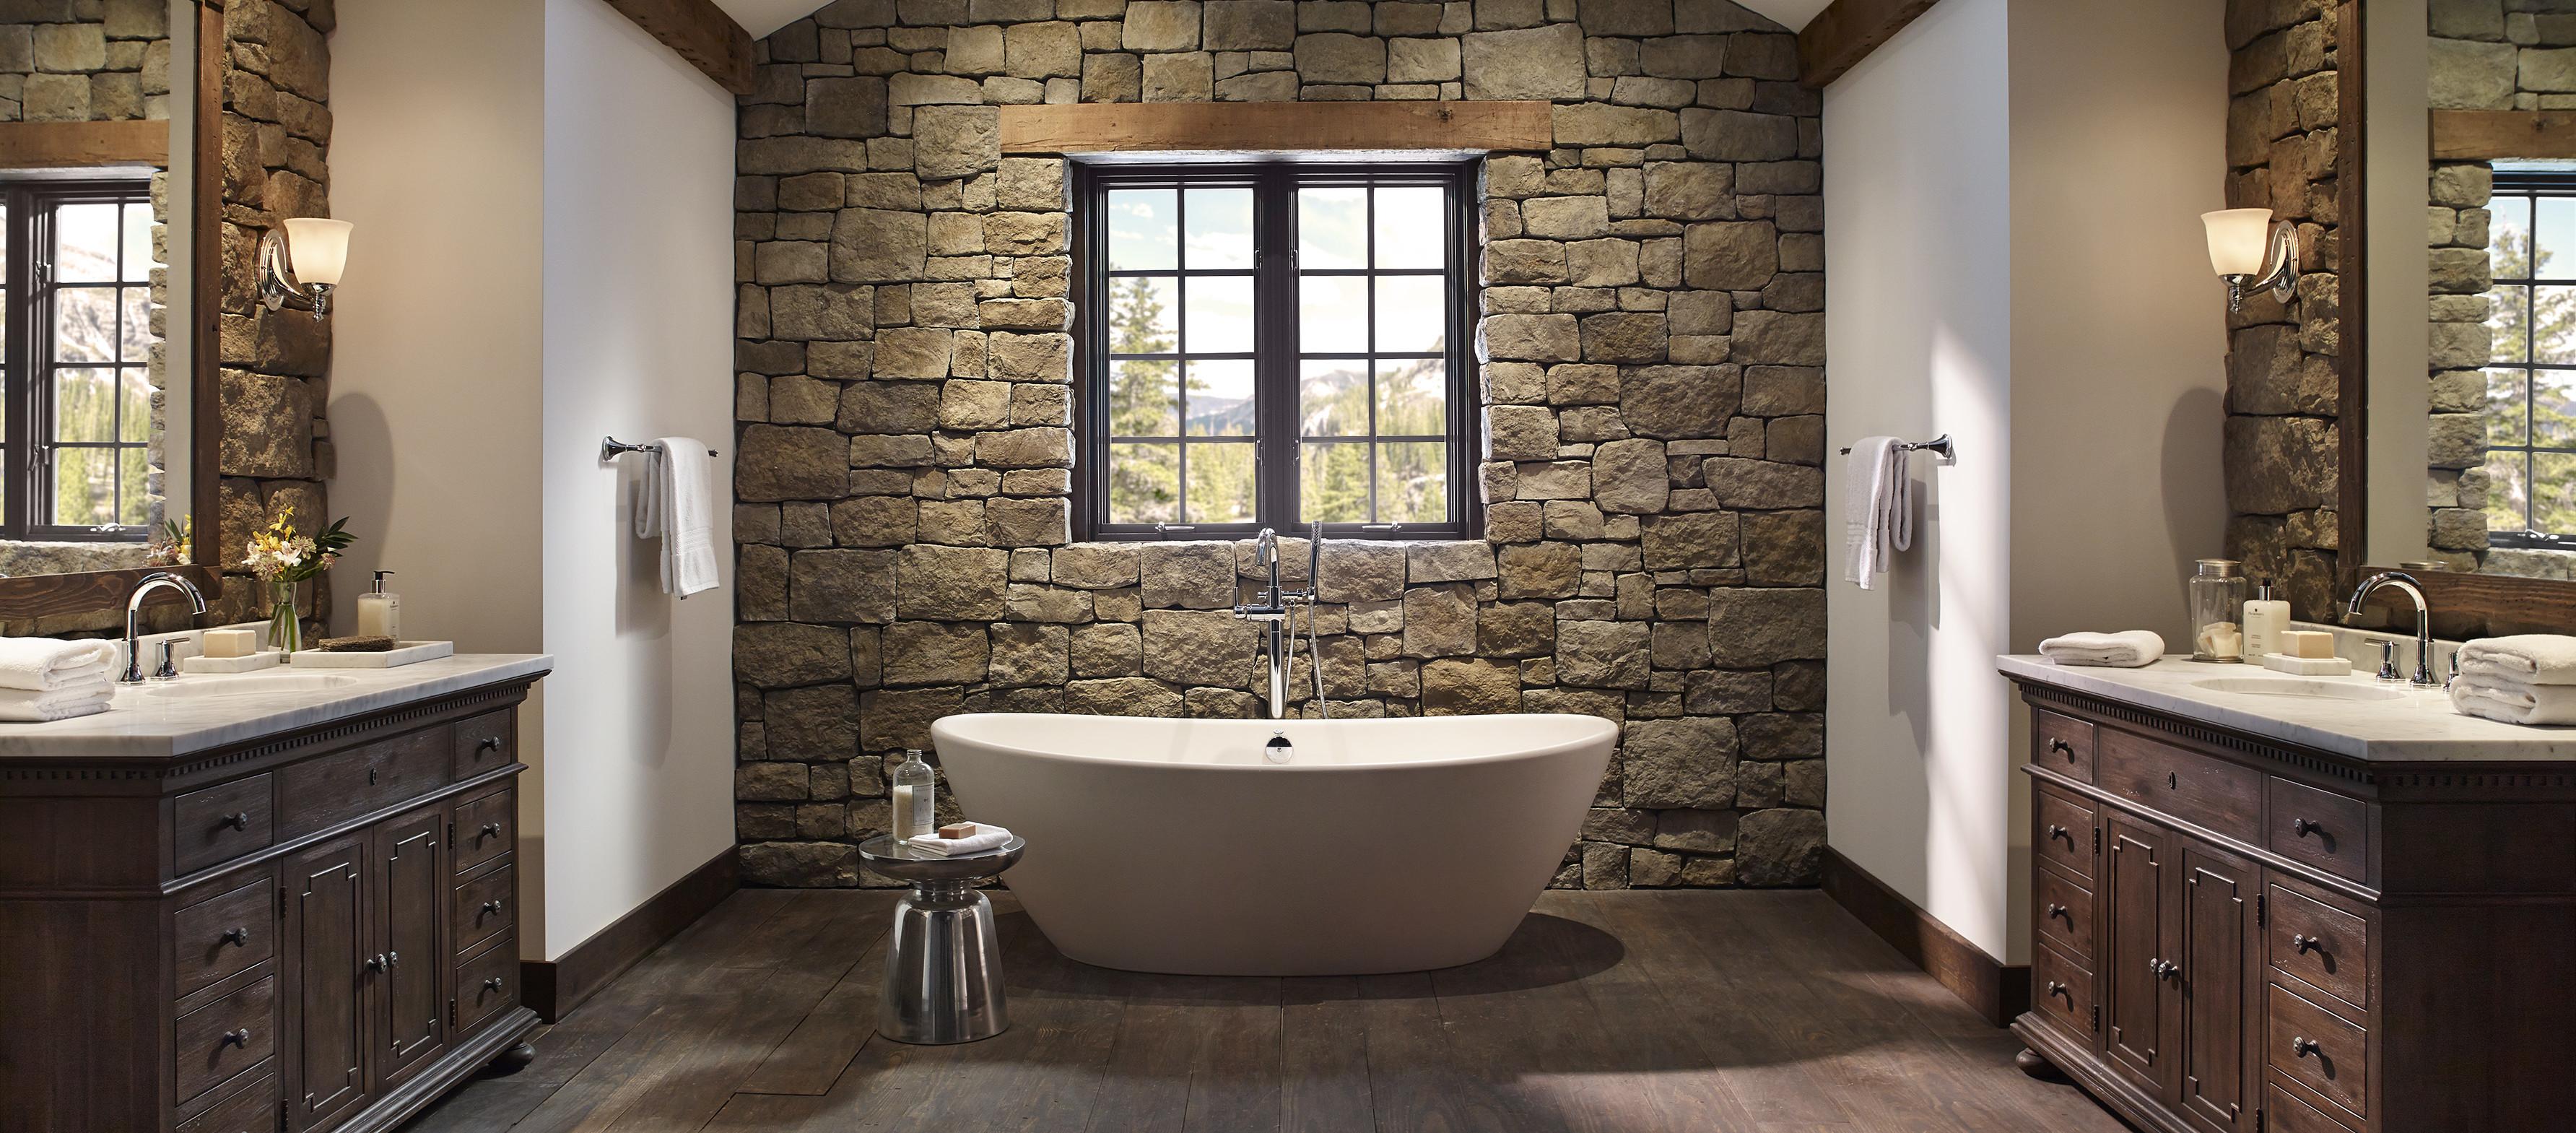 Rustic Bathroom Irefinish Of Oregon Tub Shower Tile